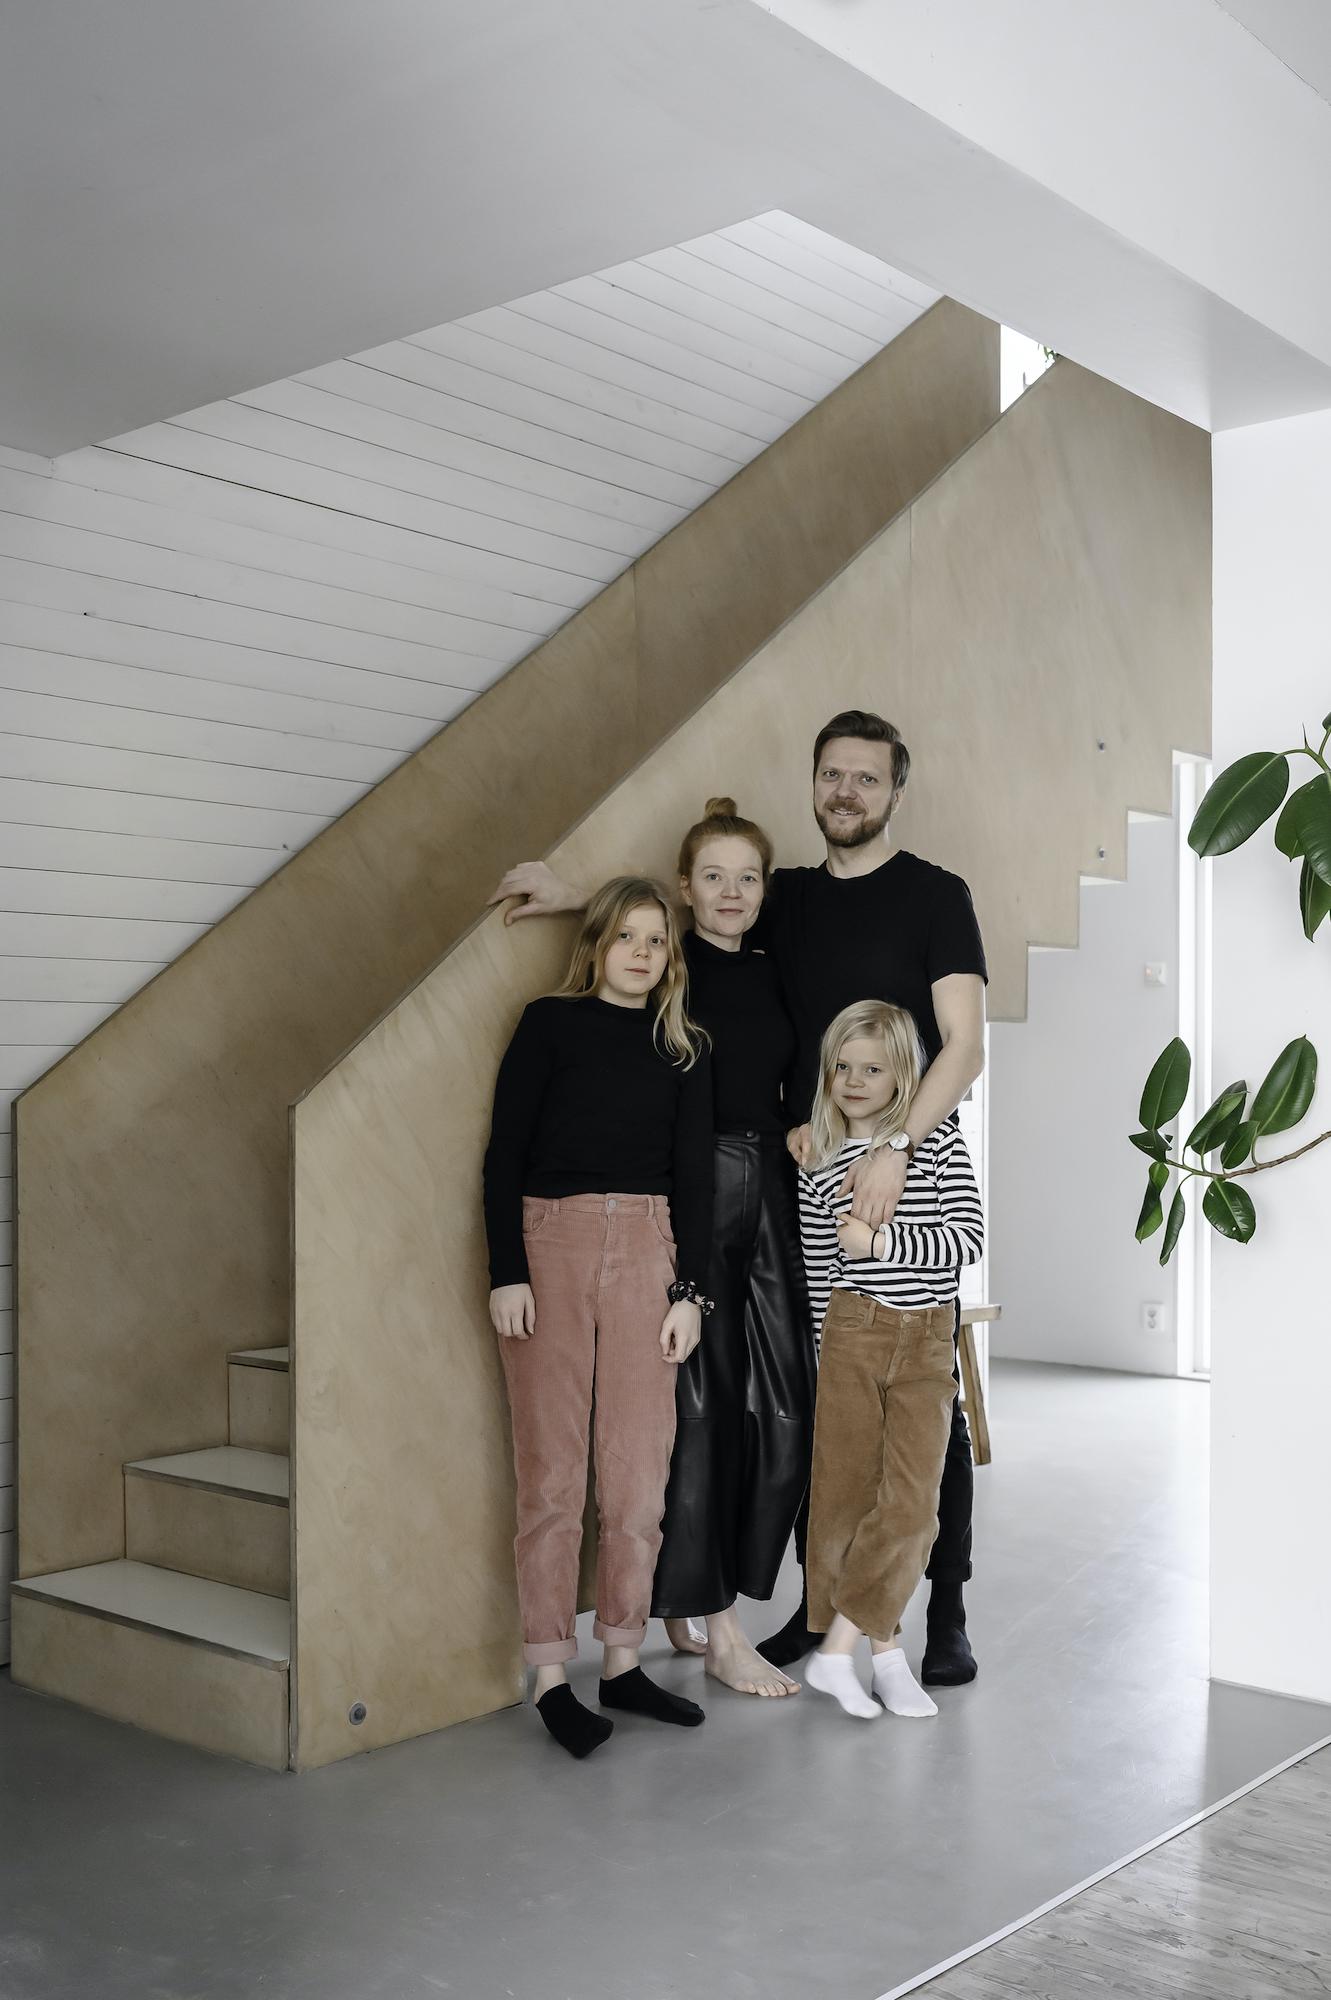 takkunen-eeva-tapani-perhe